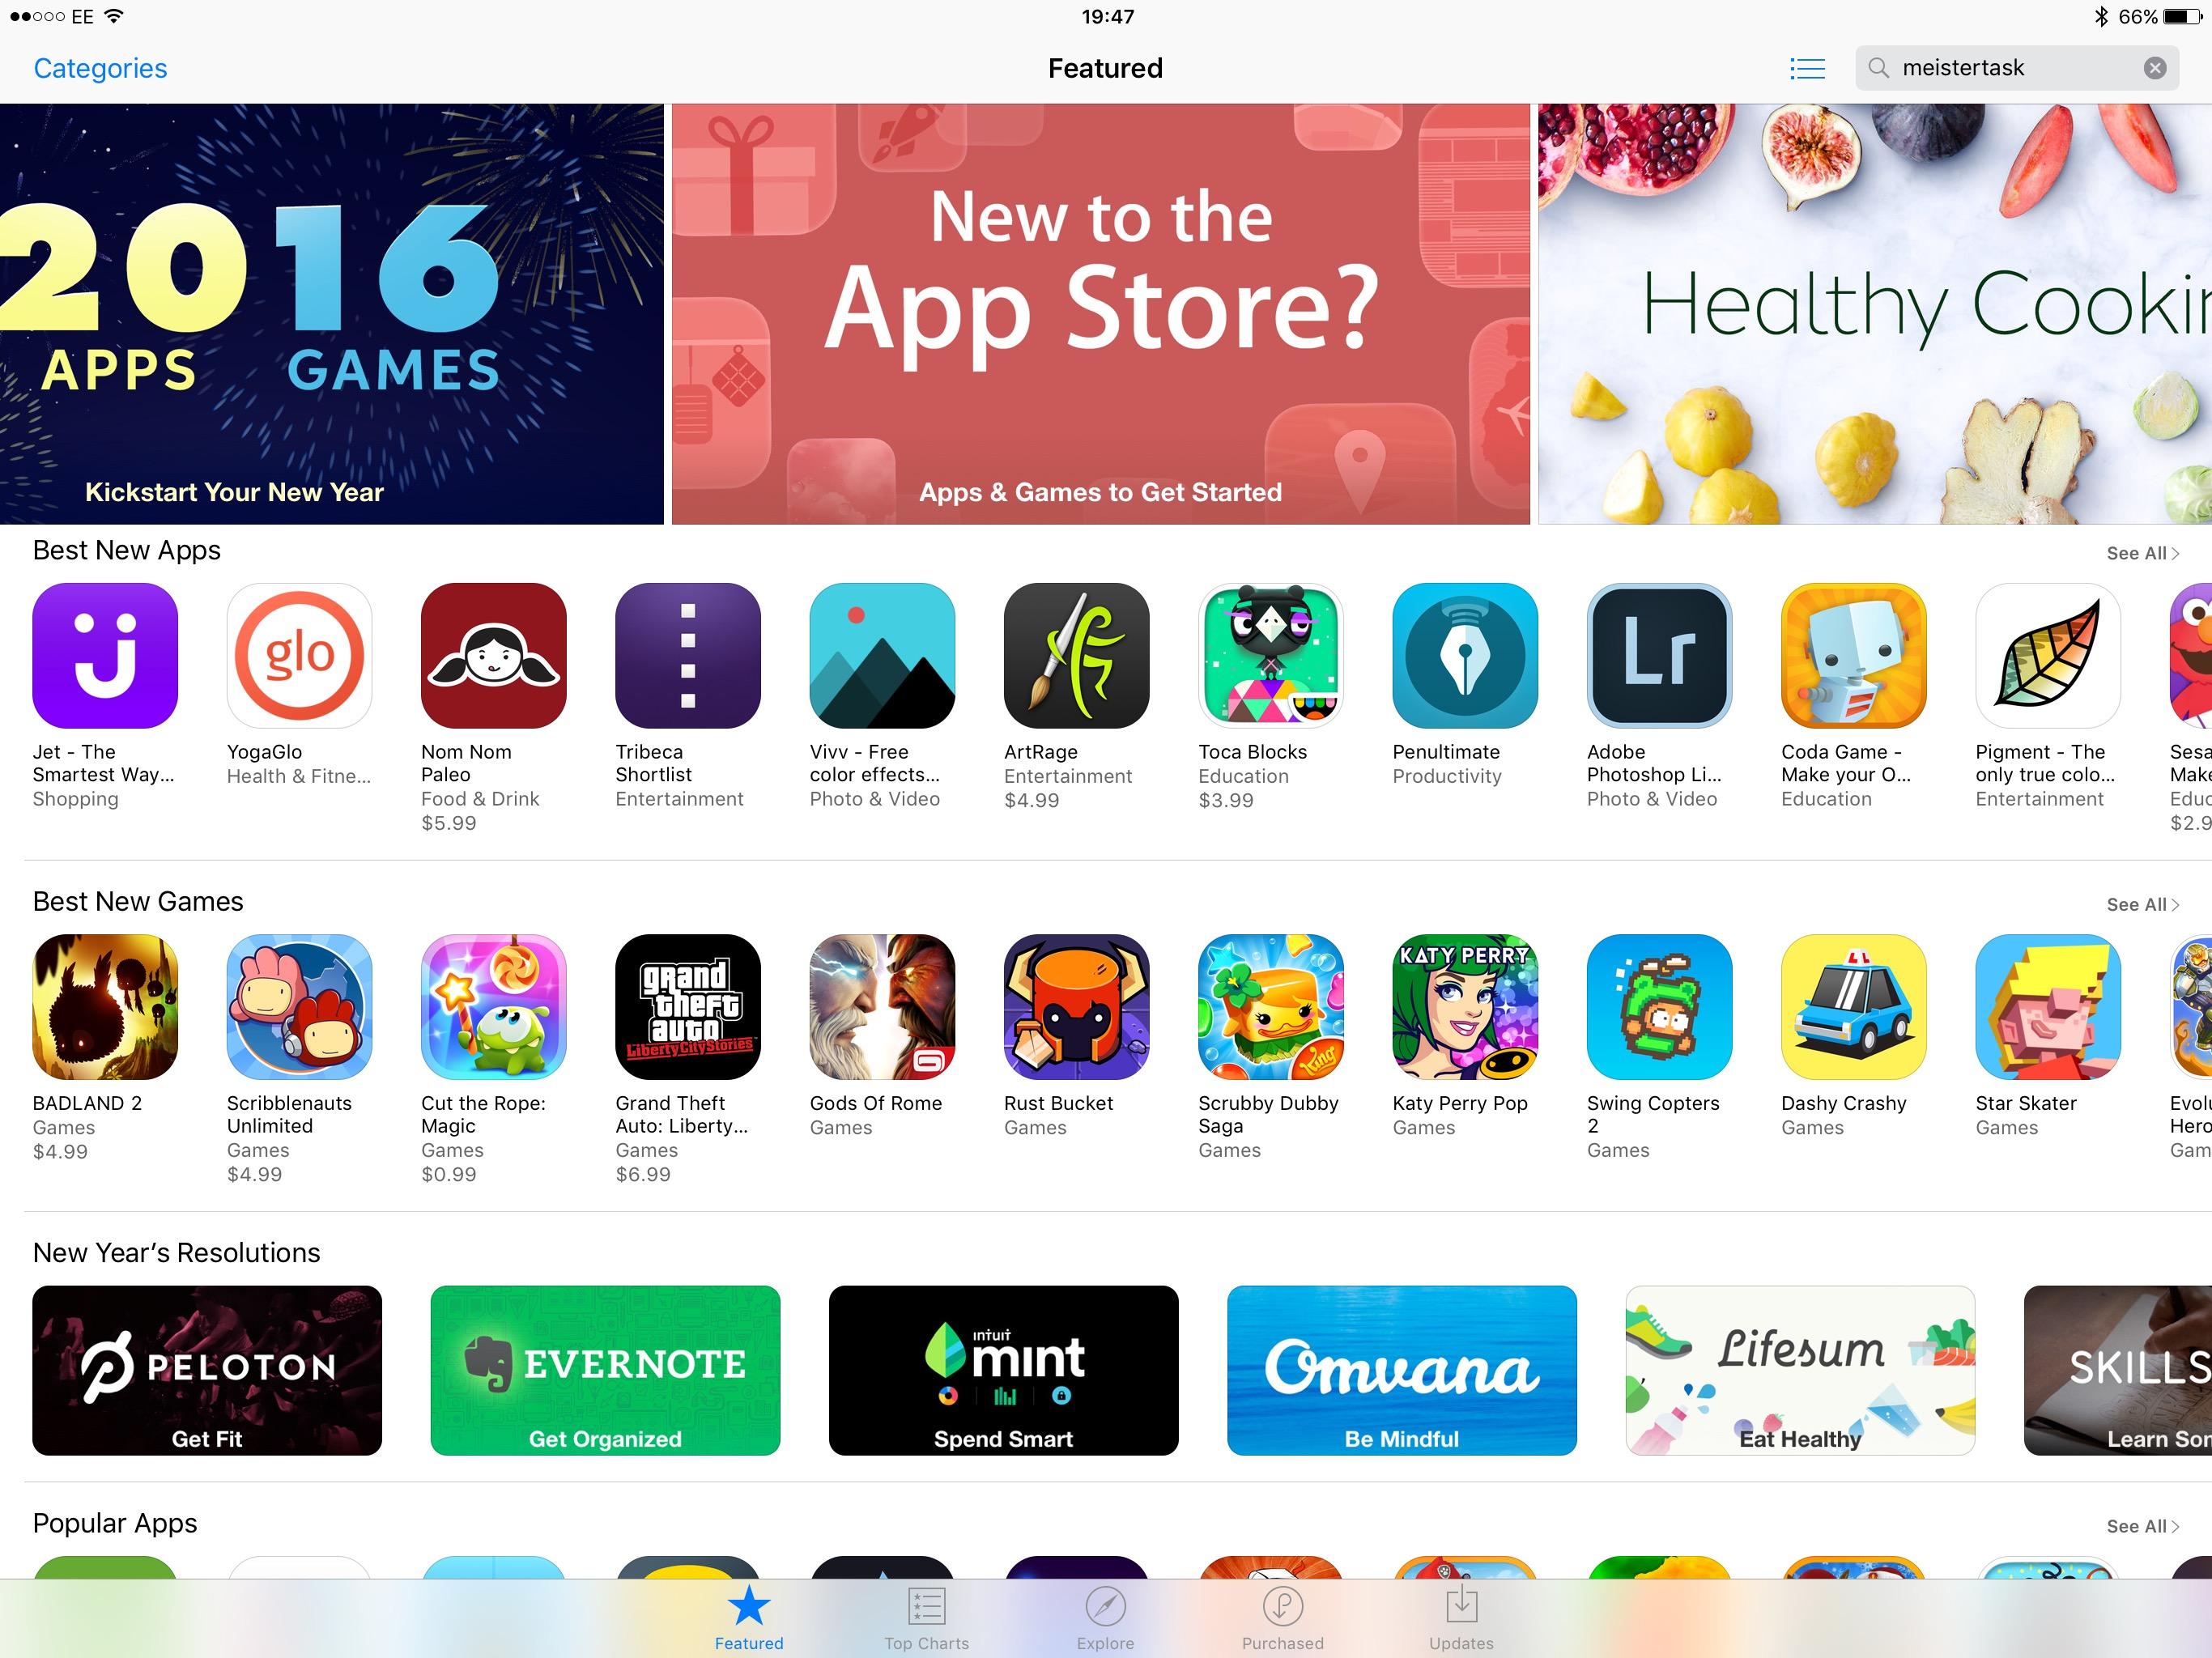 Apple announces record-breaking $1.1 billion holiday season App Store sales